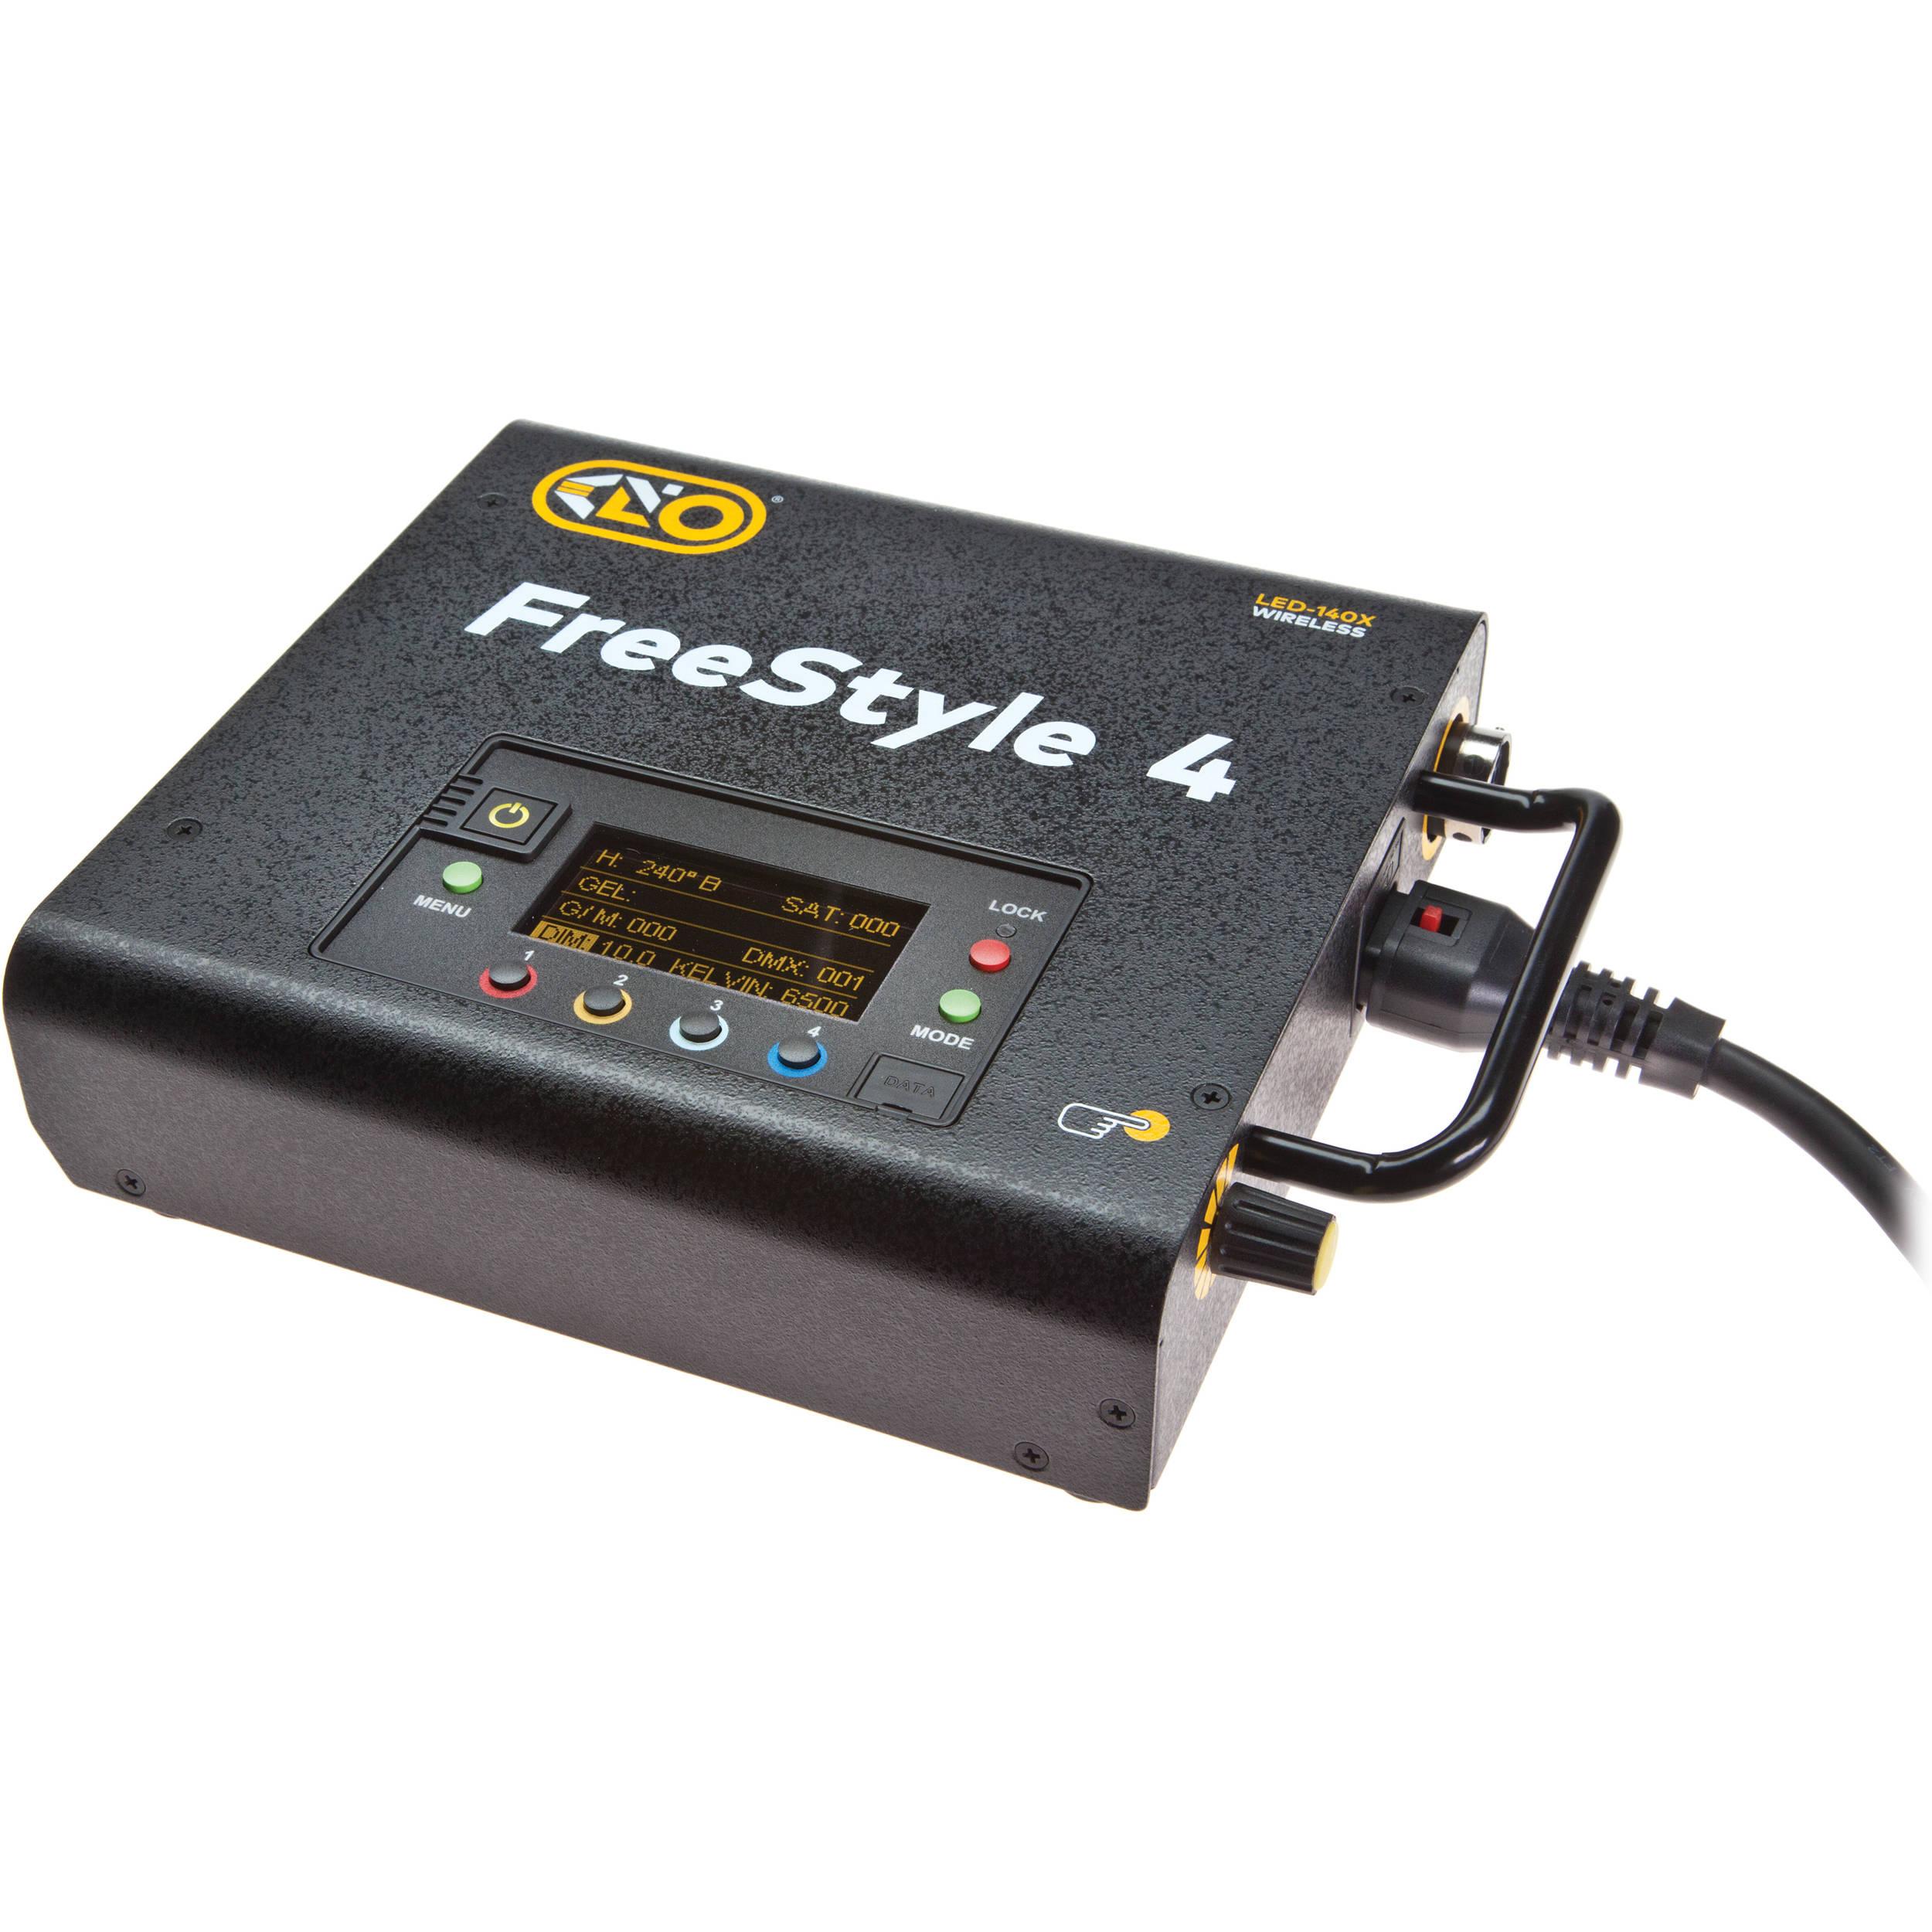 Kino Flo Freestyle 140 Led Dmx Controller For T44 Bulbs 230 Vac Cord